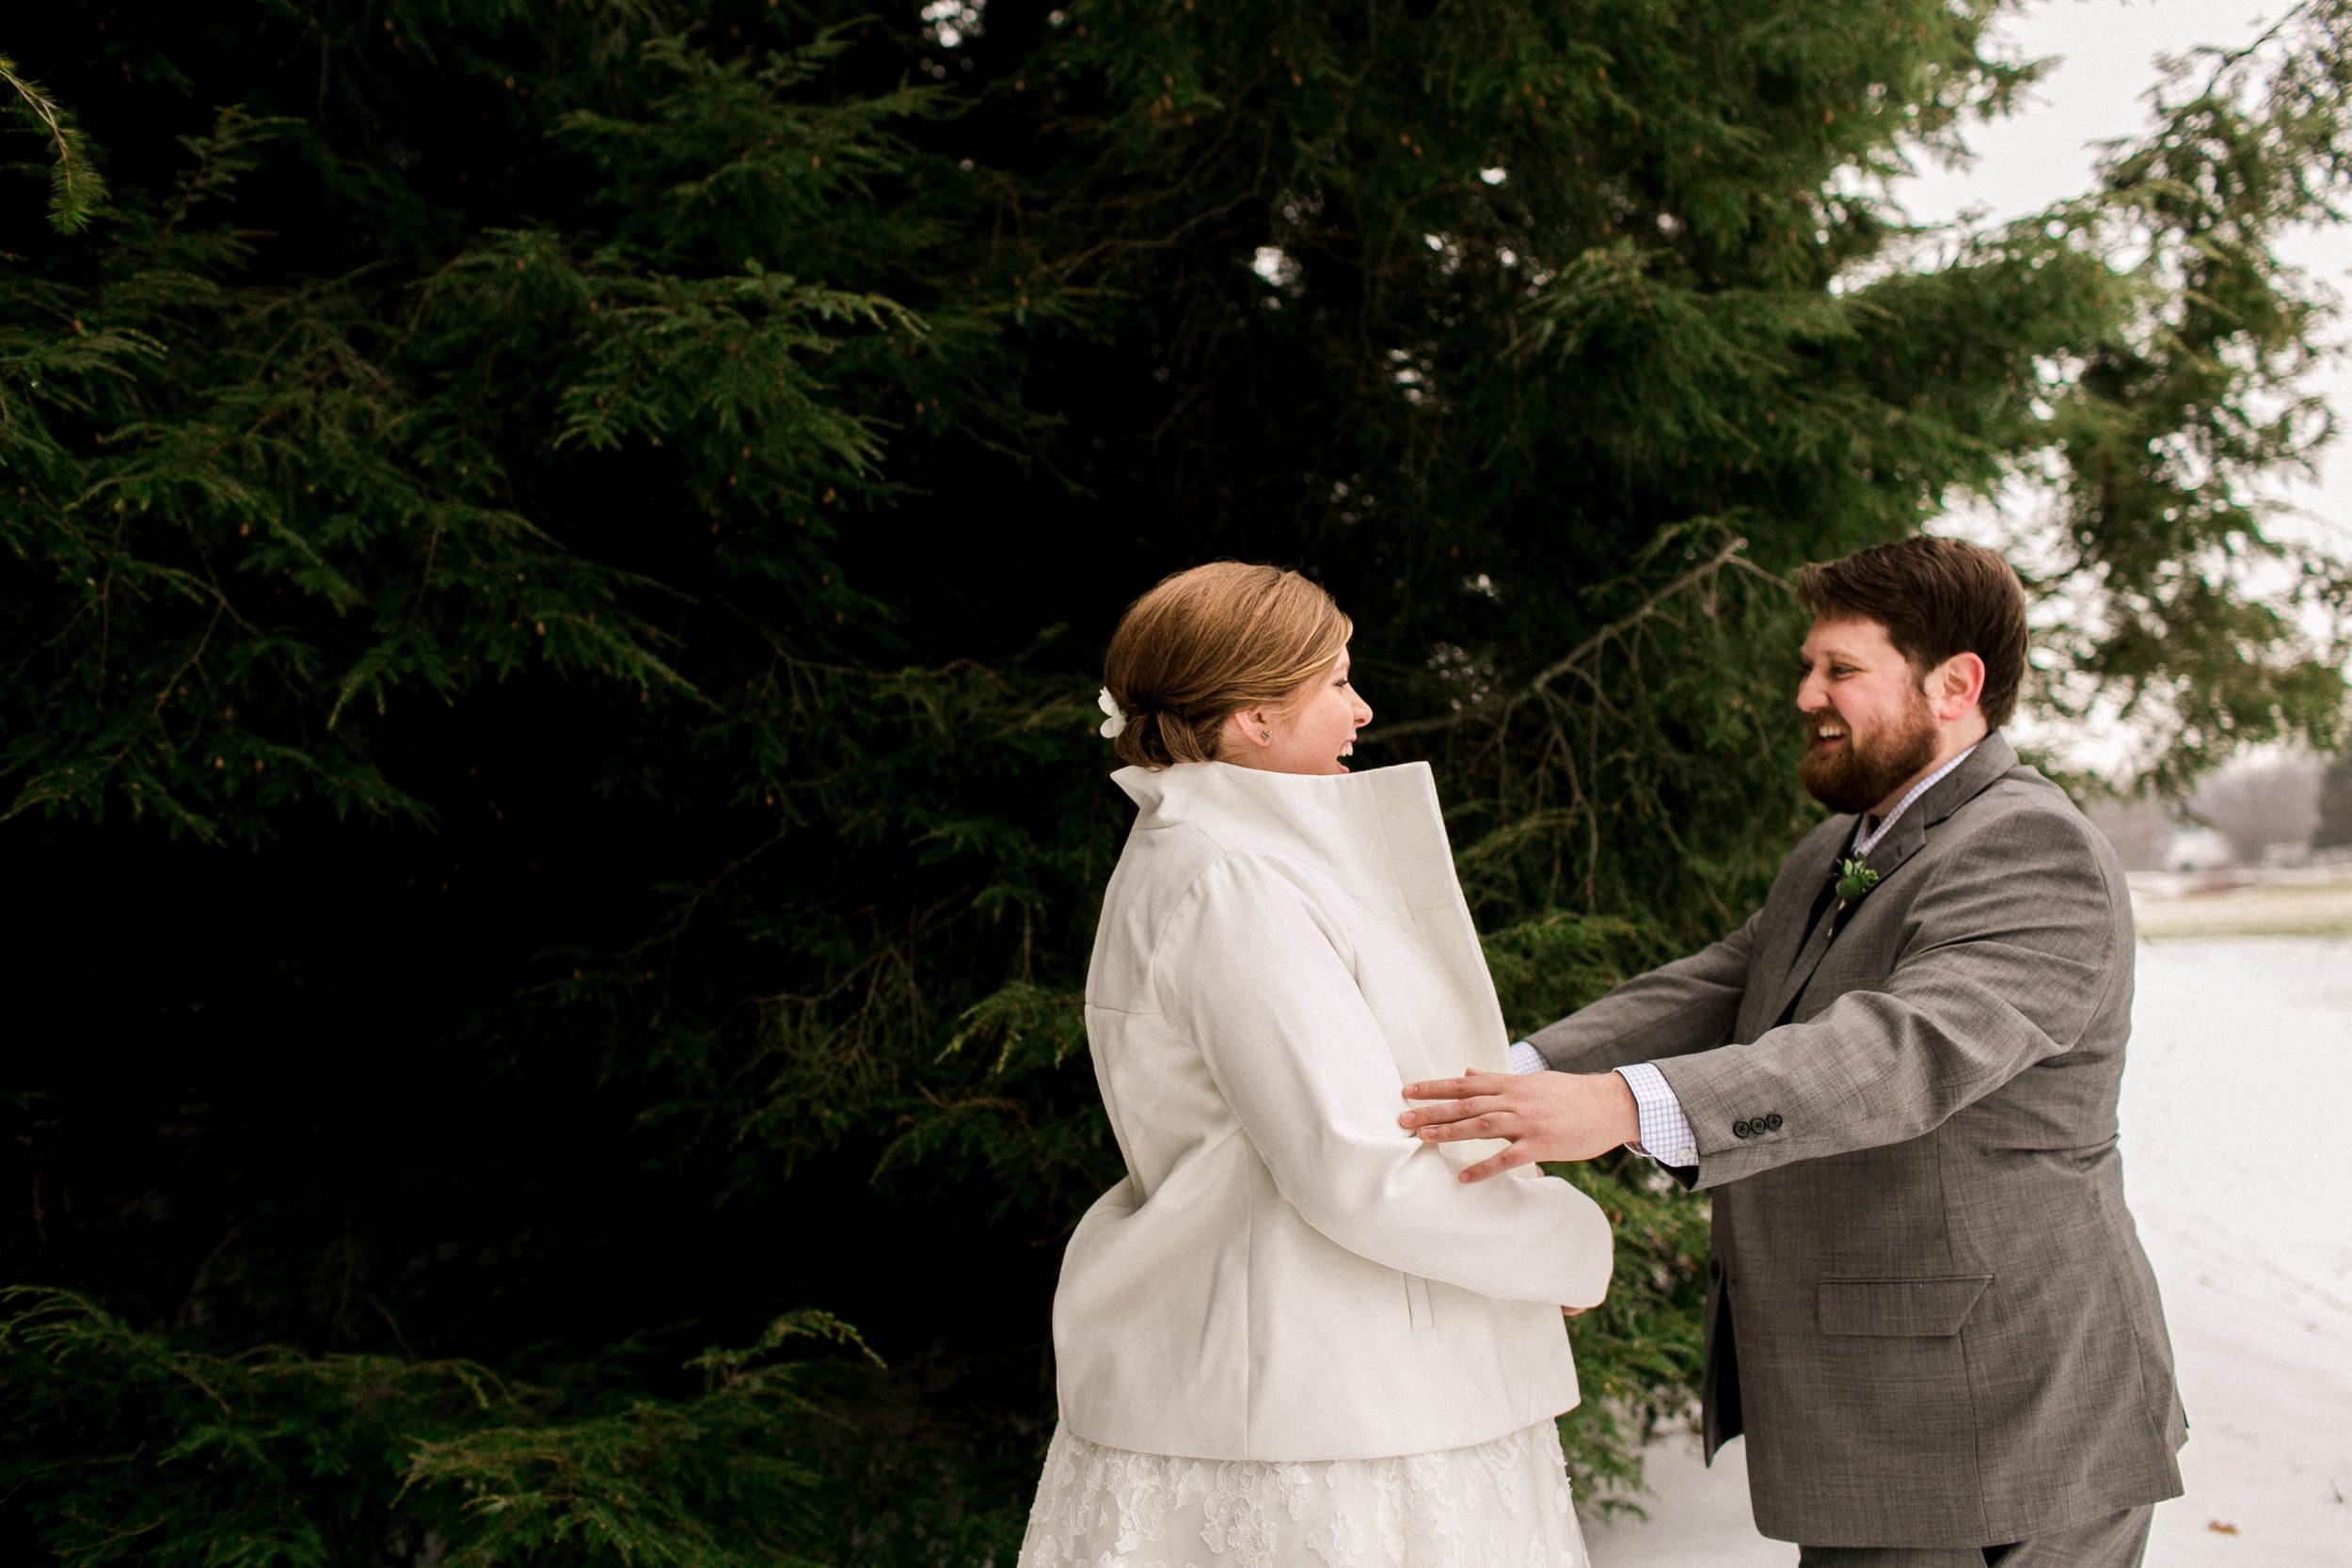 mayden photography_bridal portraits-36.jpg